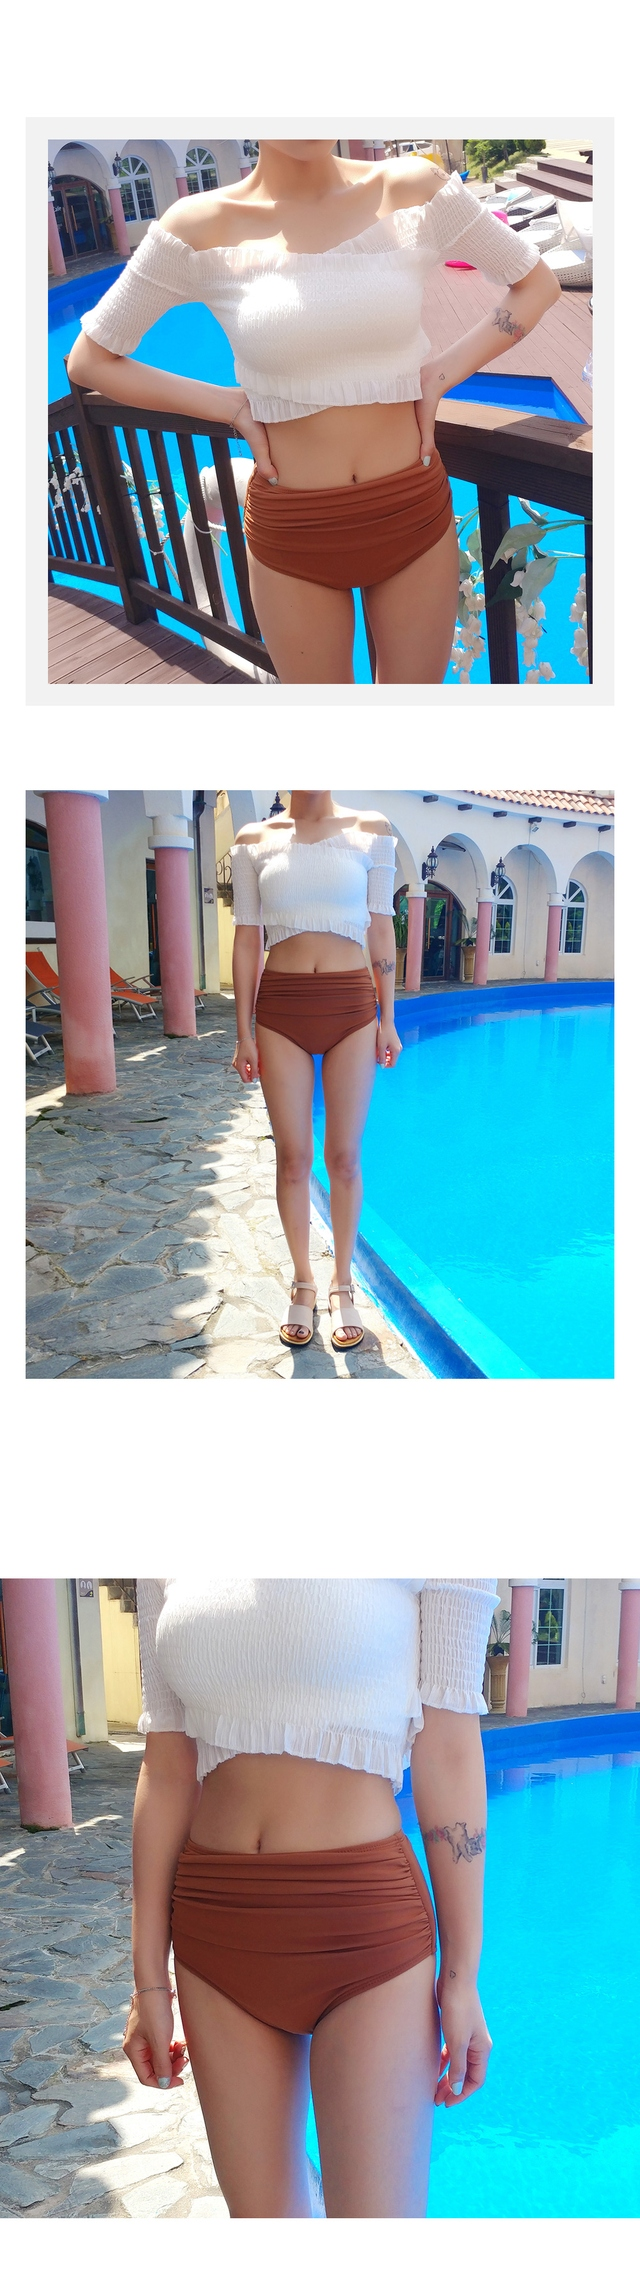 Again color scheme Bikini panties